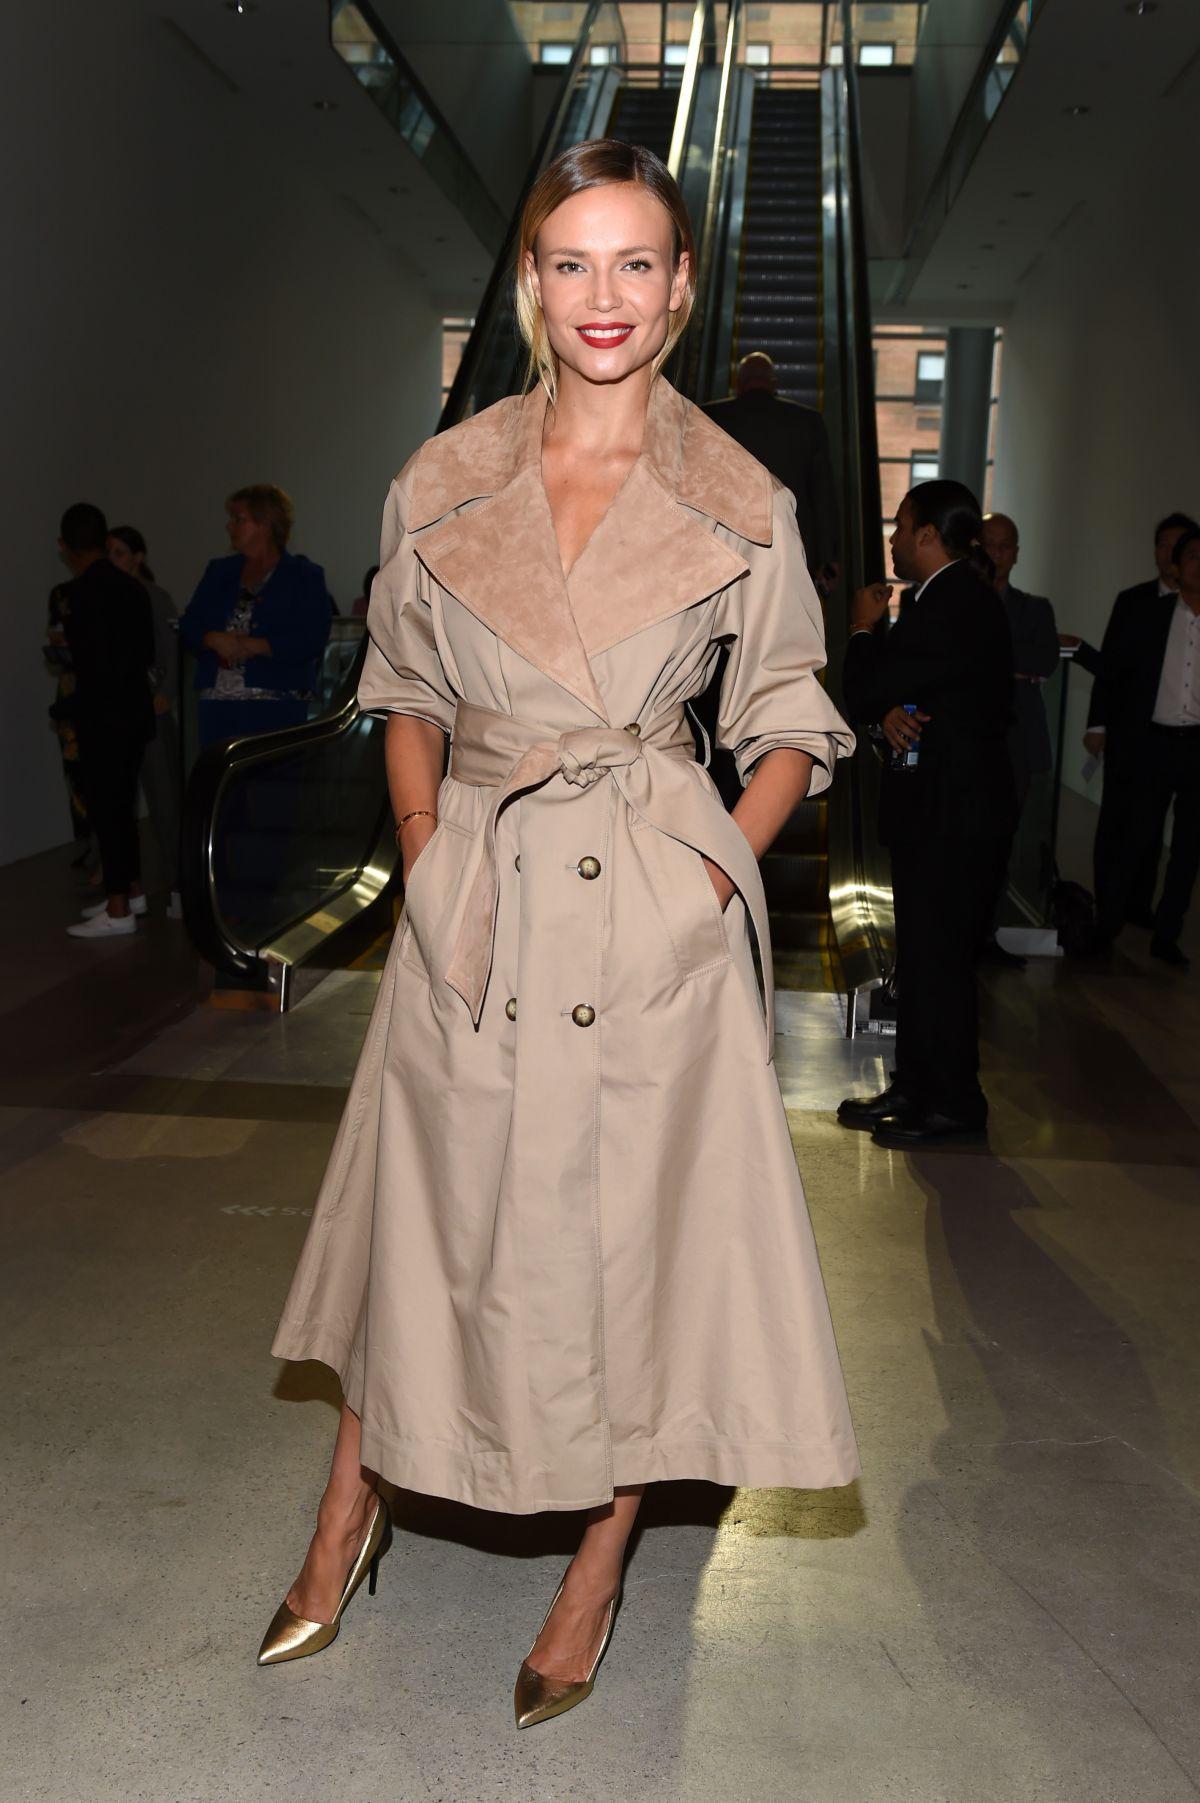 NATASHA POLY at Oscar De La Renta Fashion Show at NYFW in New York 09/11/2017